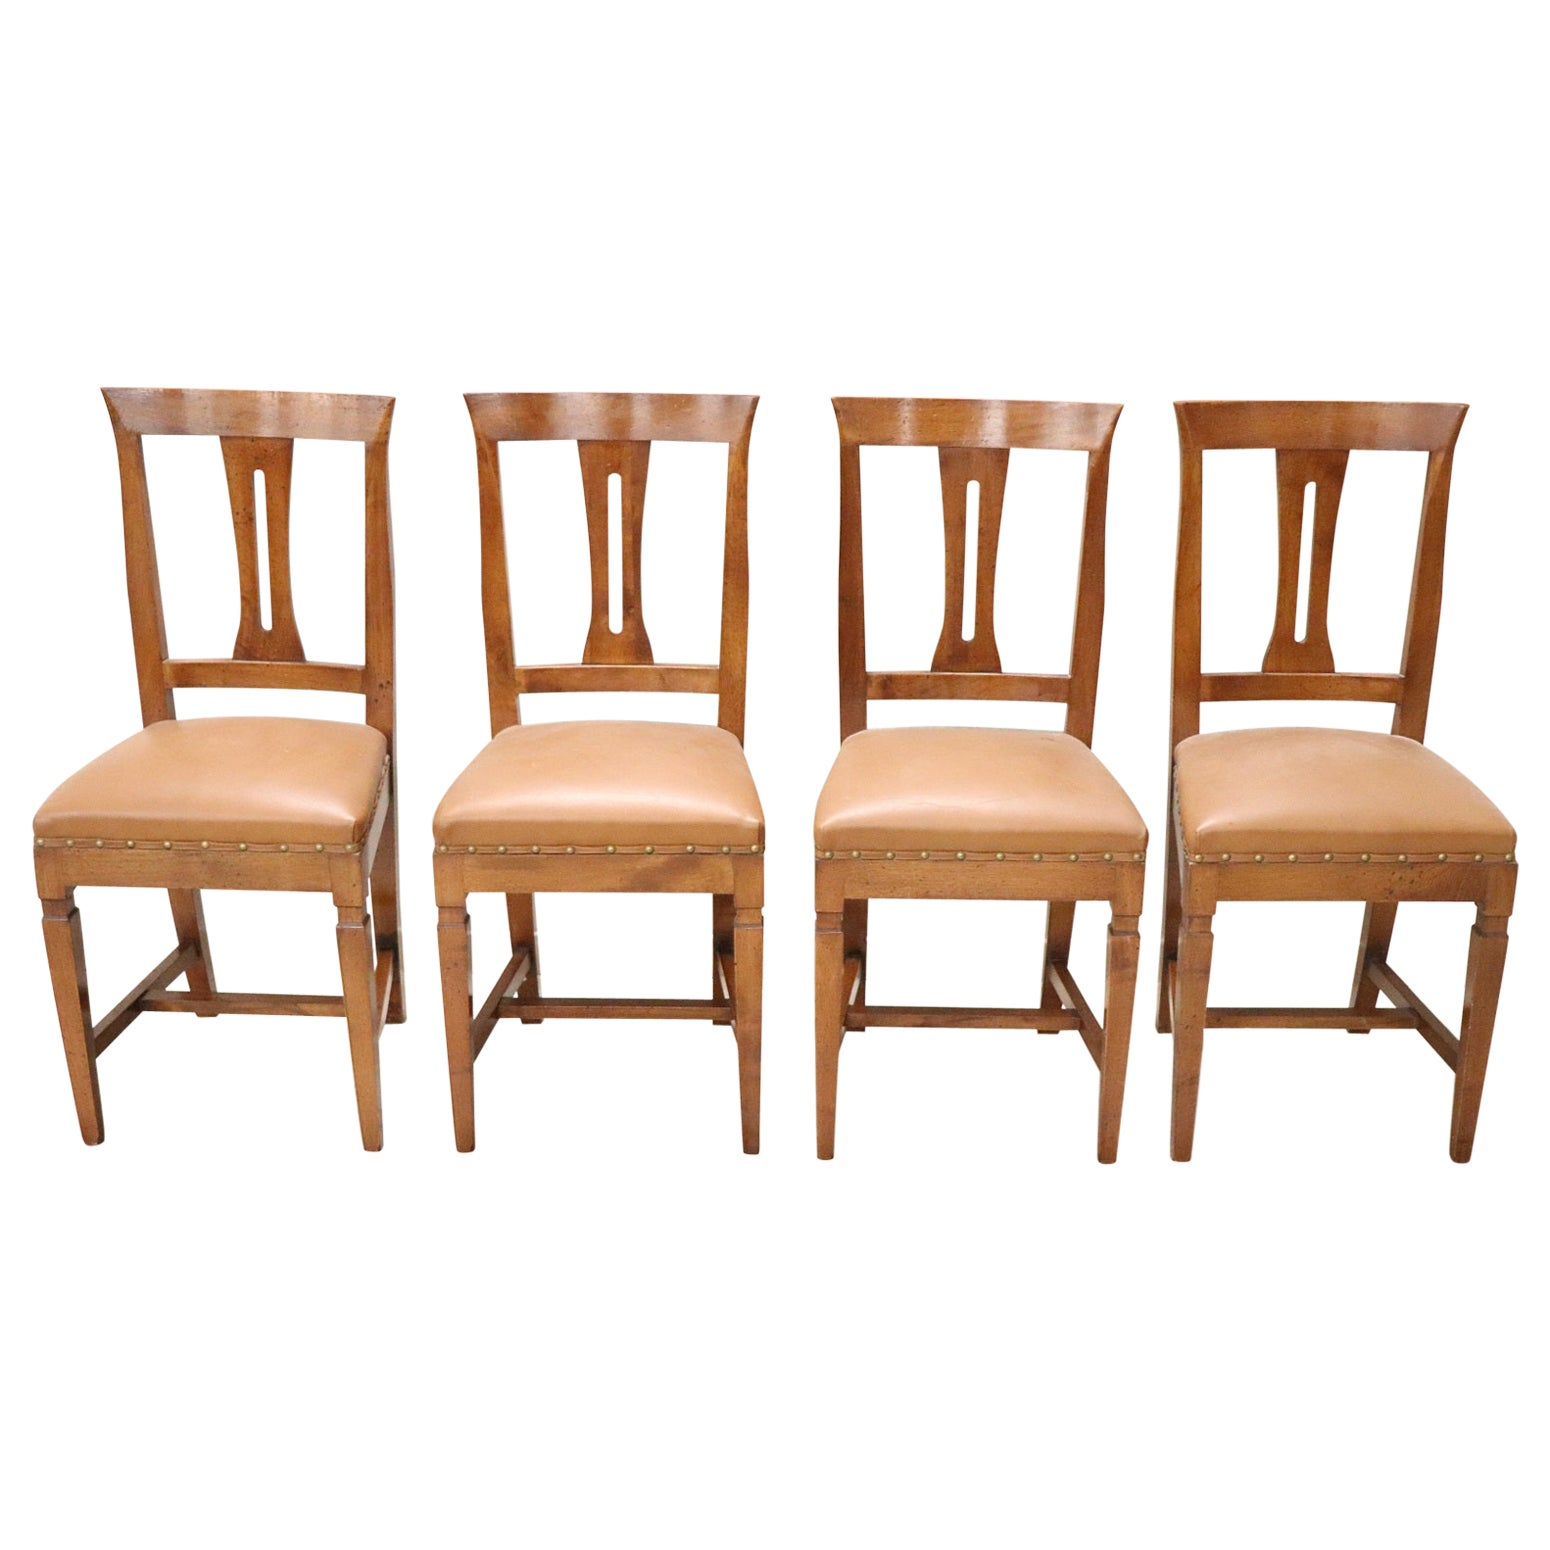 20th Century Italian Louis XVI Style Walnut Wood Four Chairs